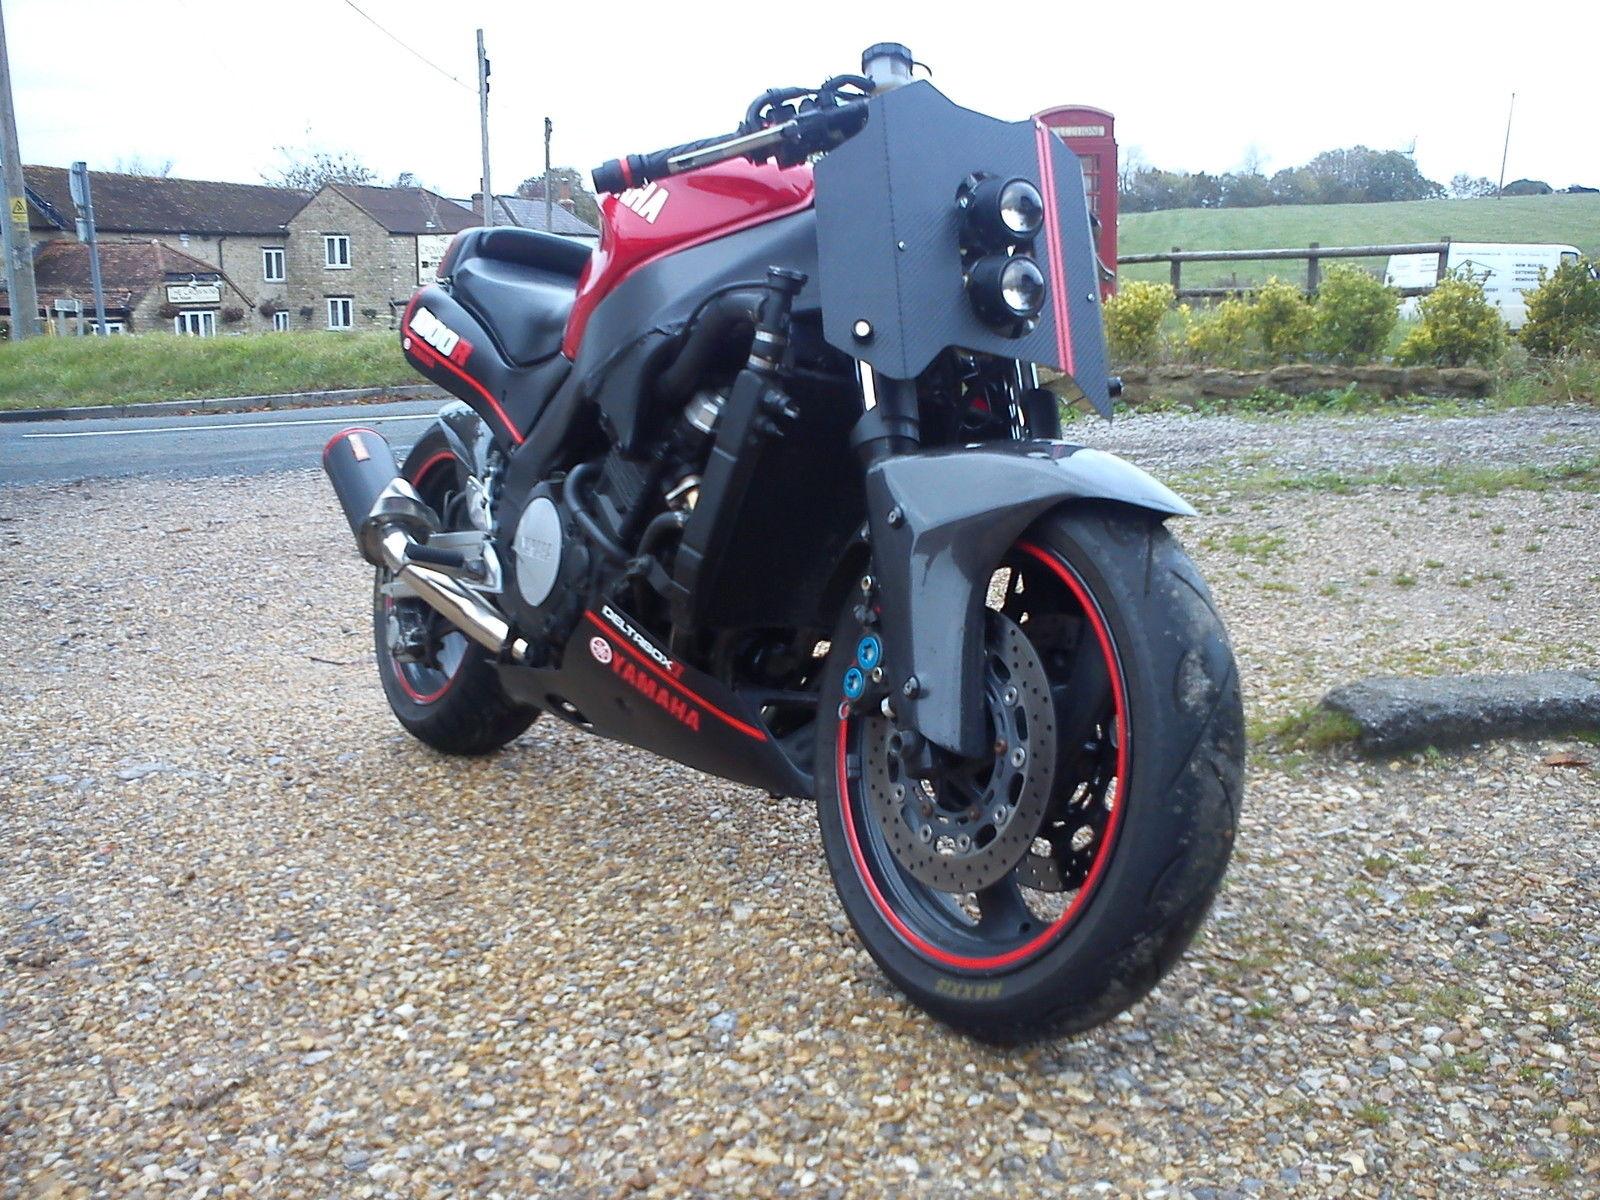 Yamaha Yzf 1000 R >> Yamaha Yzf1000r Thunderace Streetfighter Cafe Racer Wheelie Machine